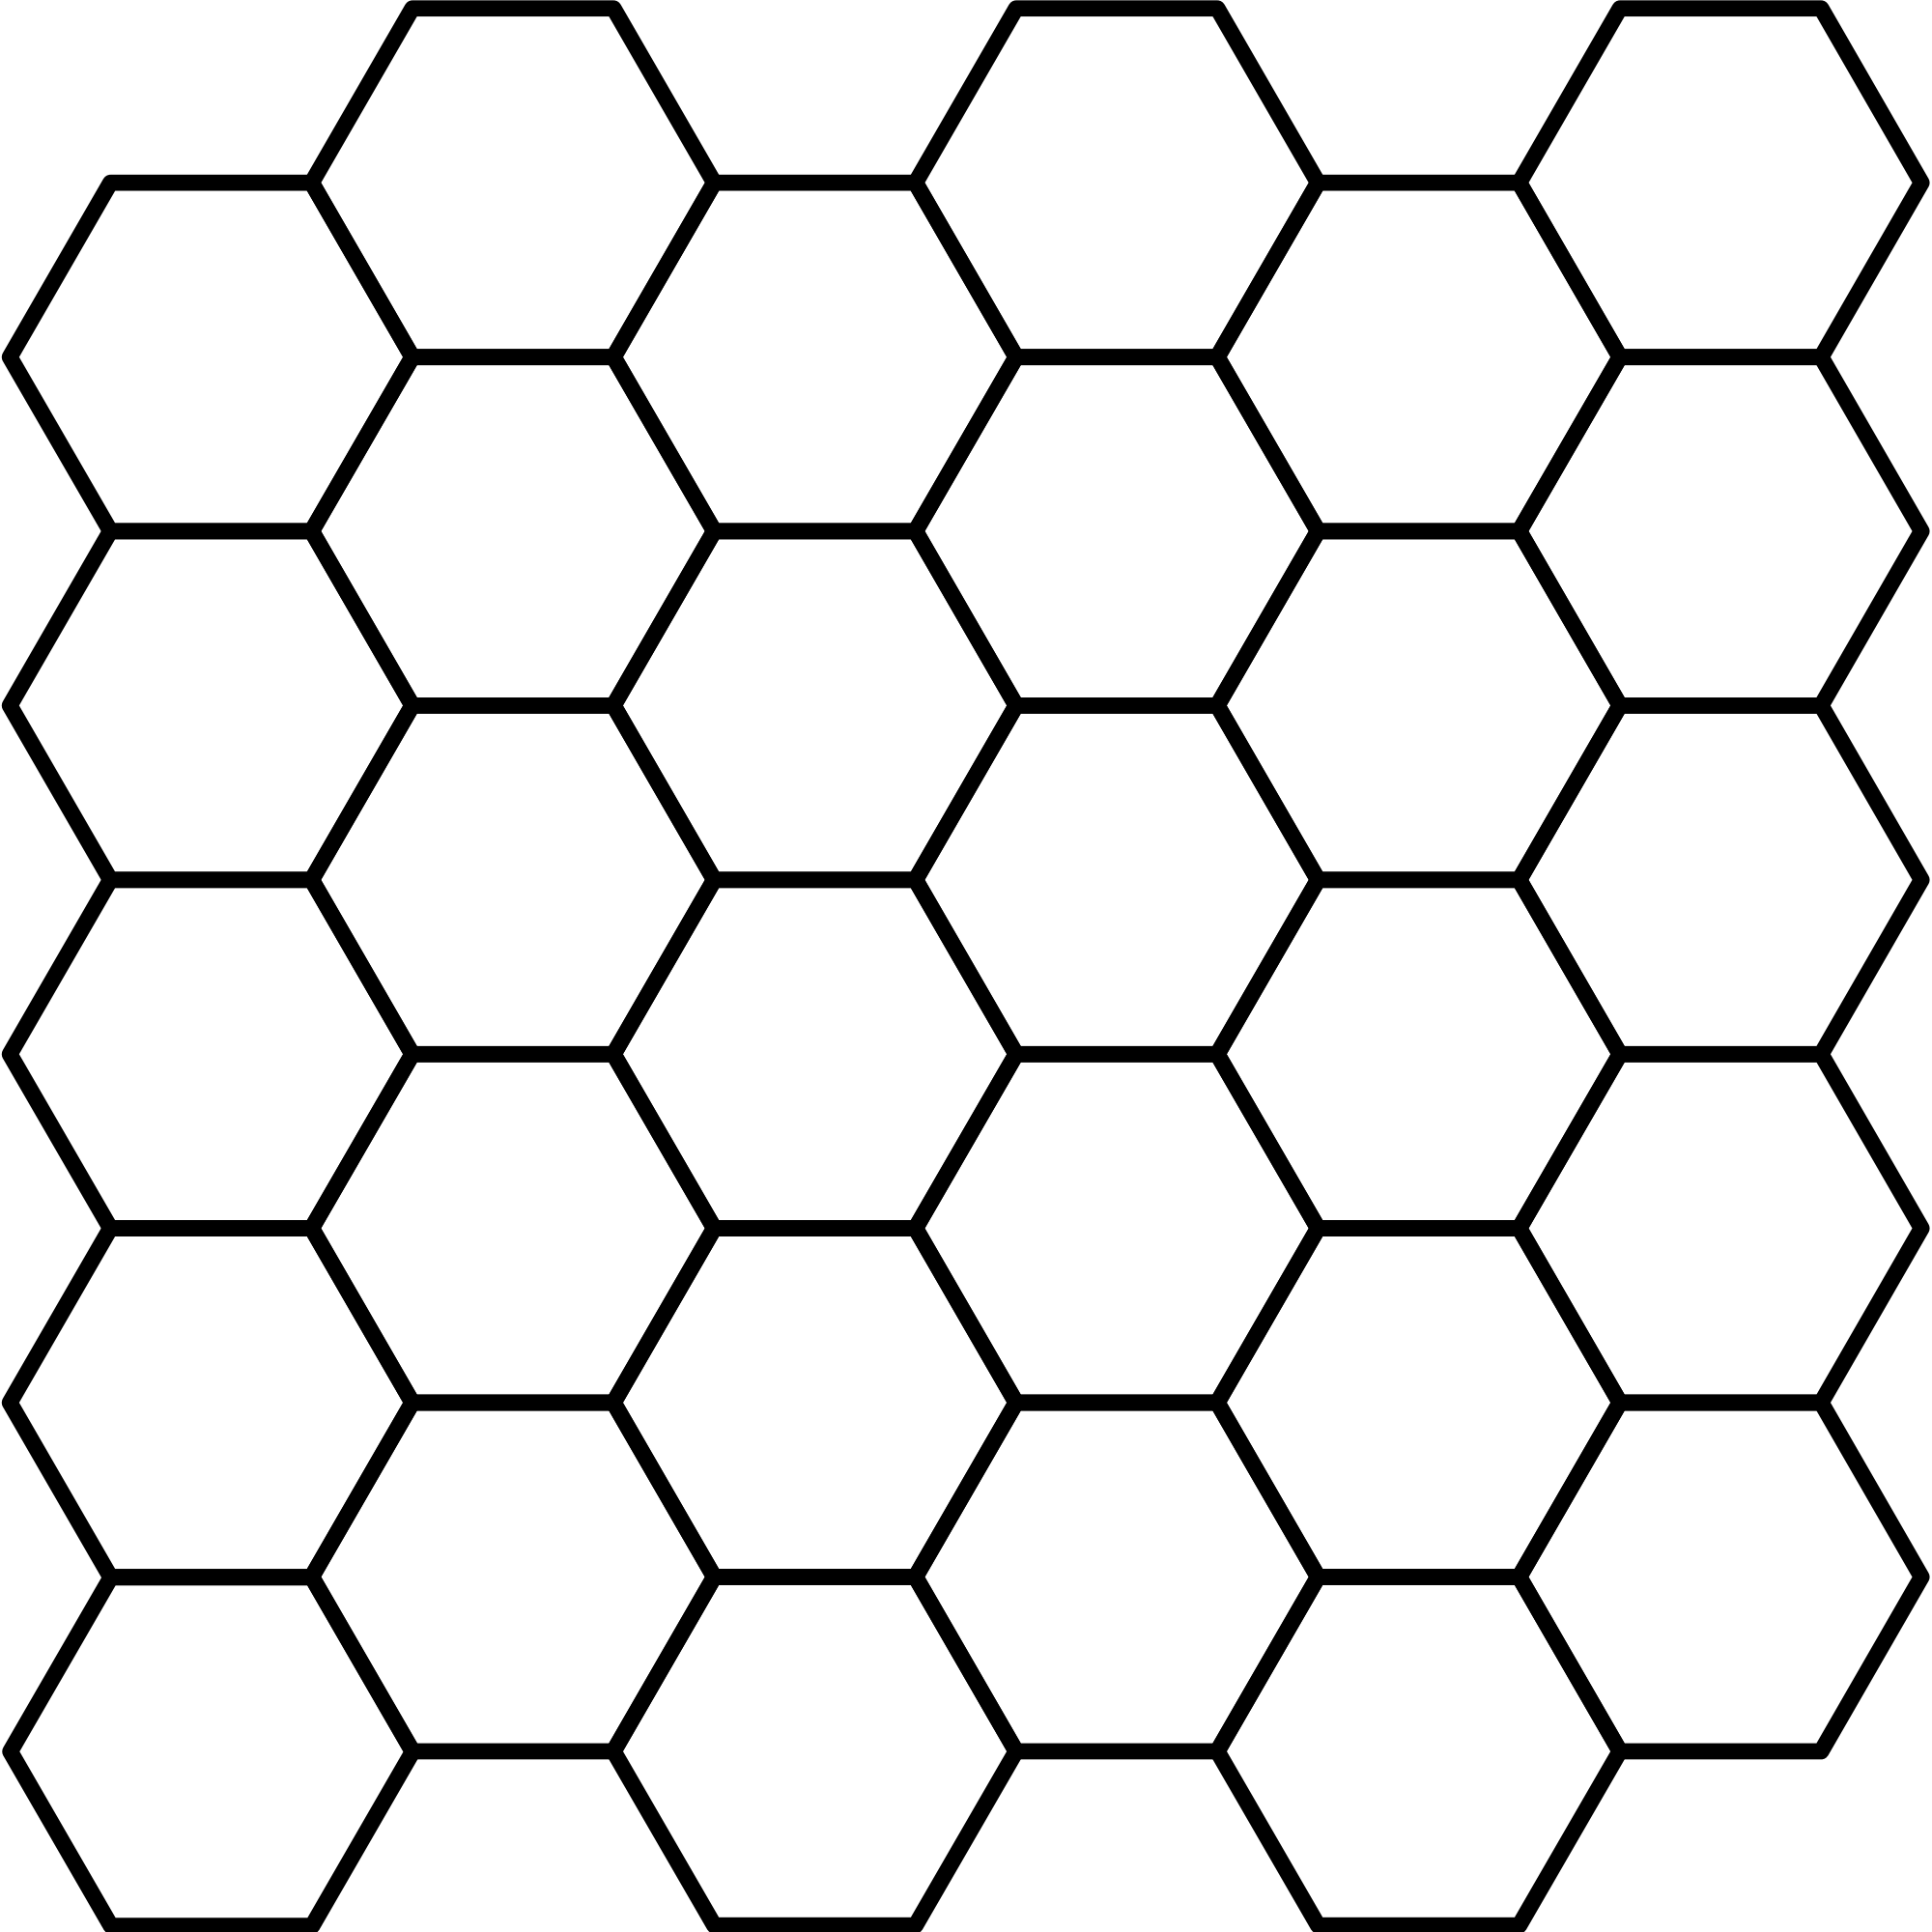 File:Hexagonal tiling.svg.